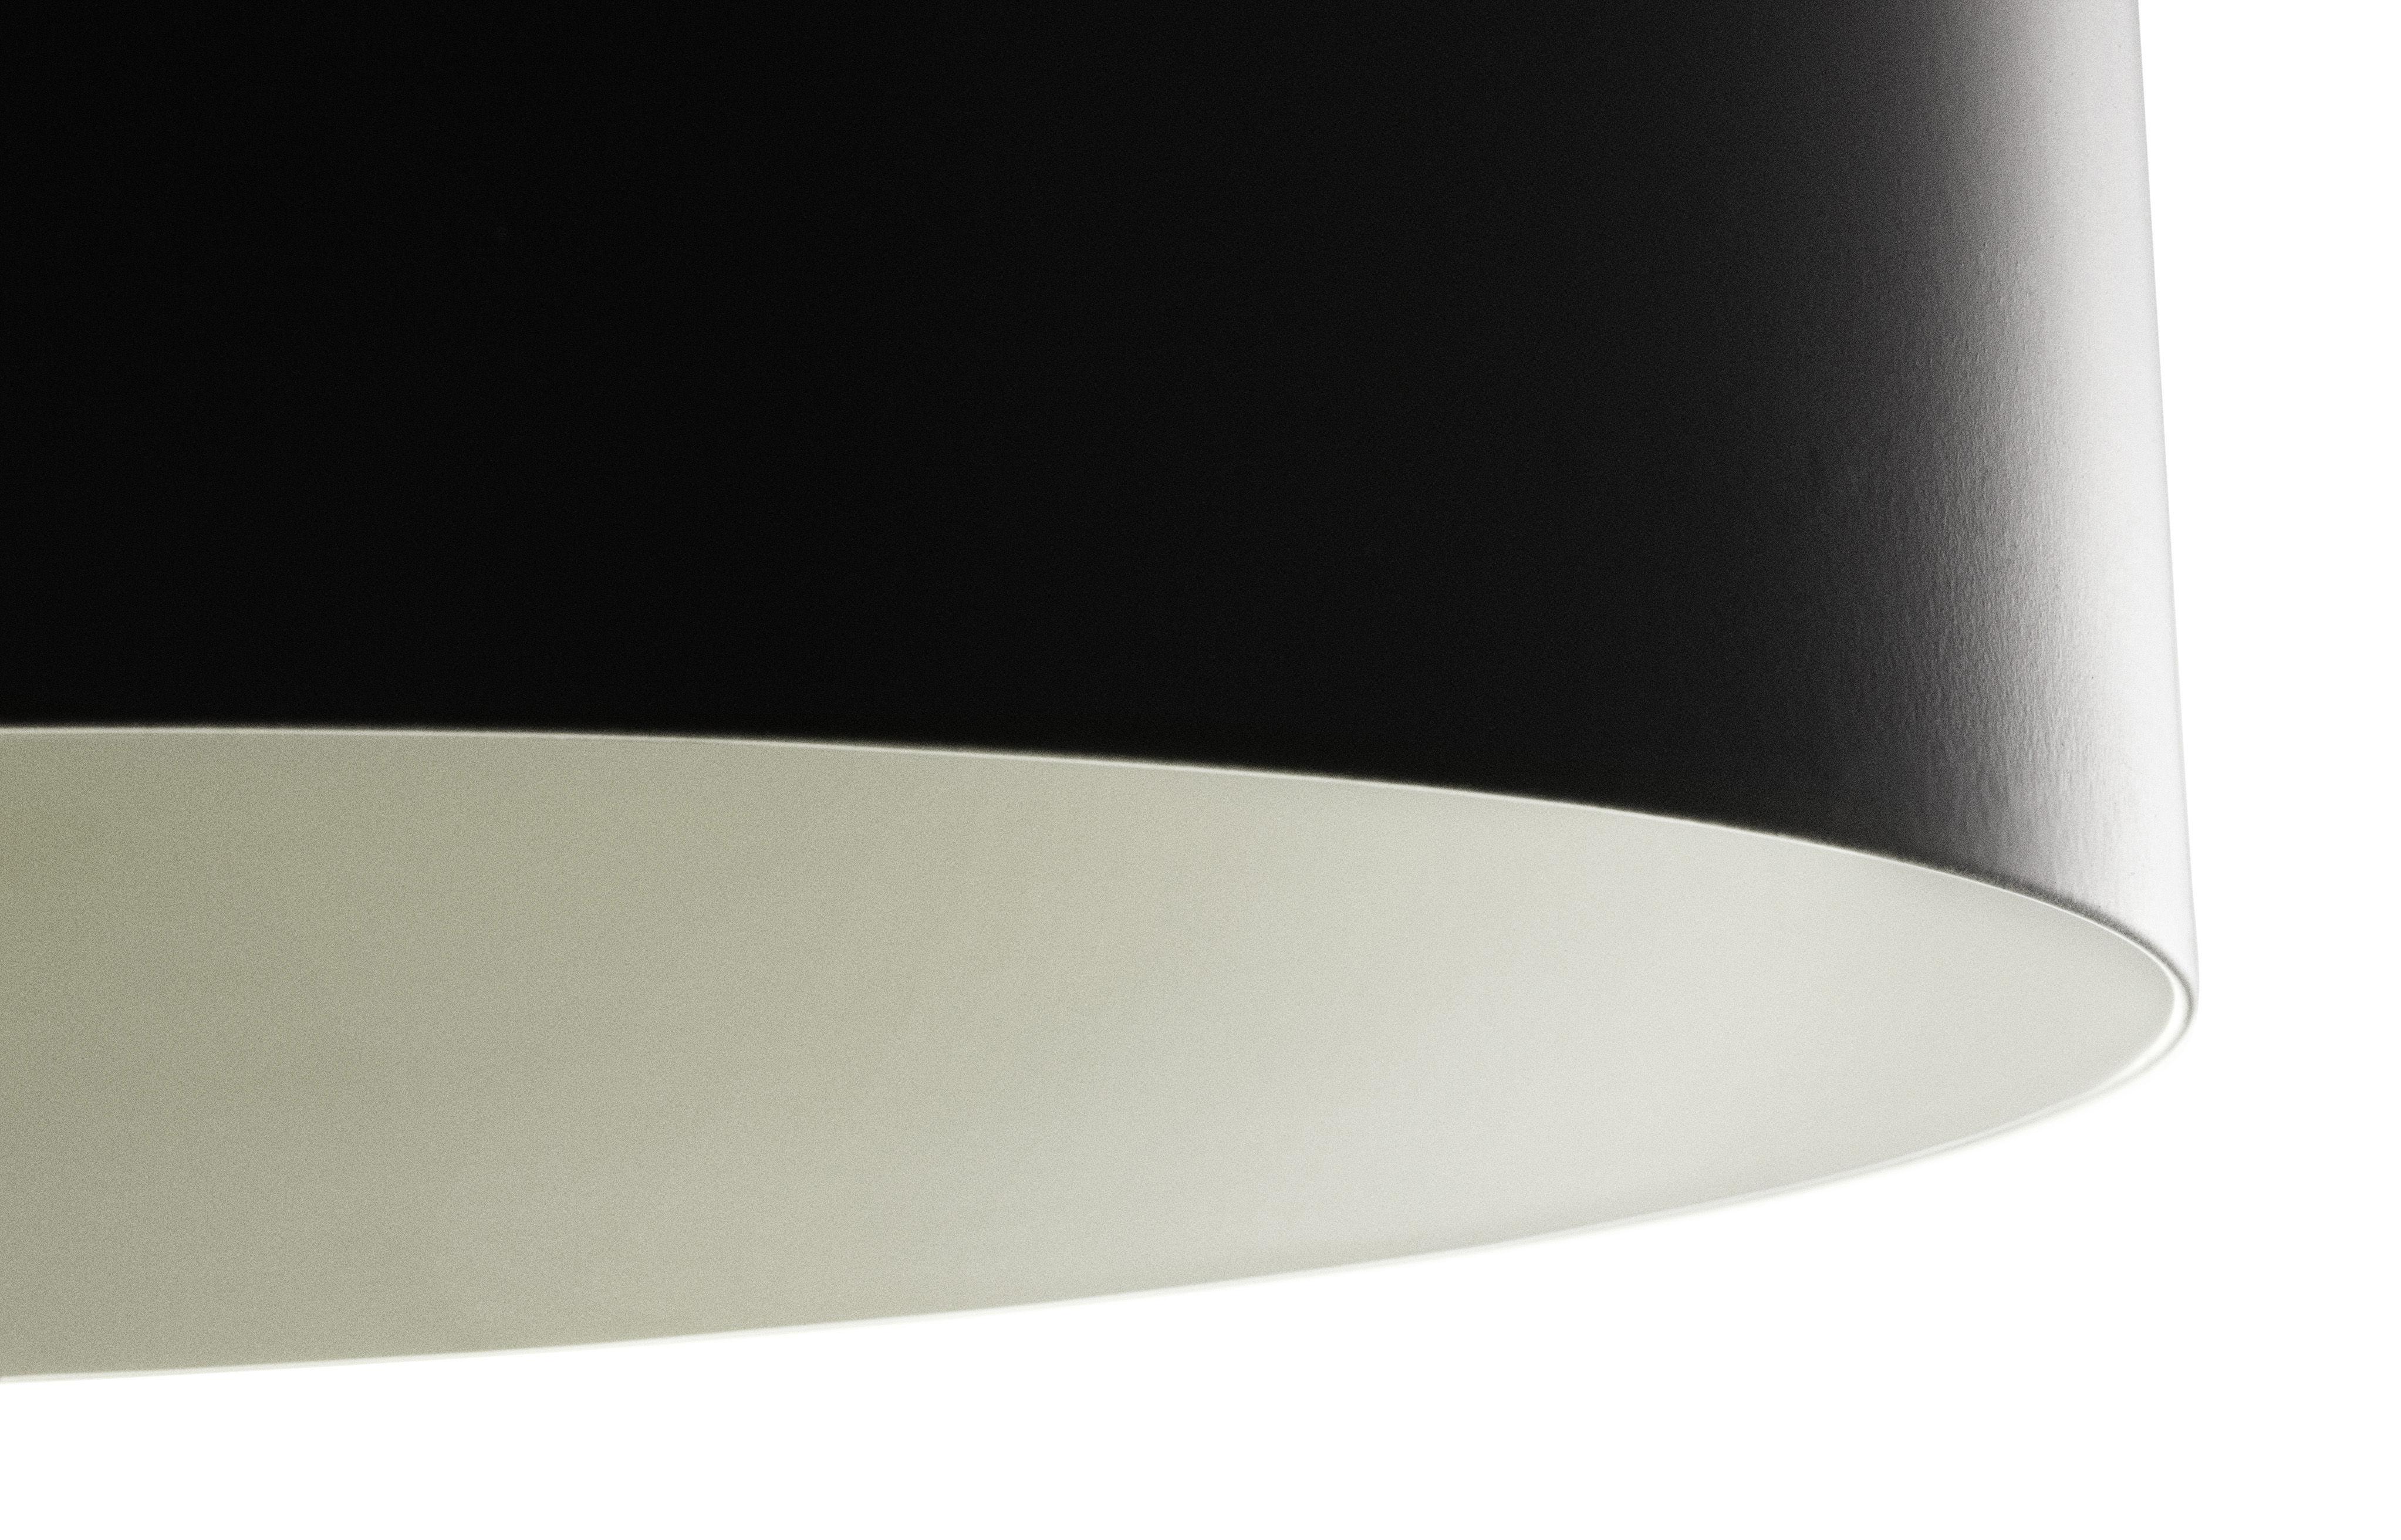 suspension hang lamp noir normann copenhagen. Black Bedroom Furniture Sets. Home Design Ideas